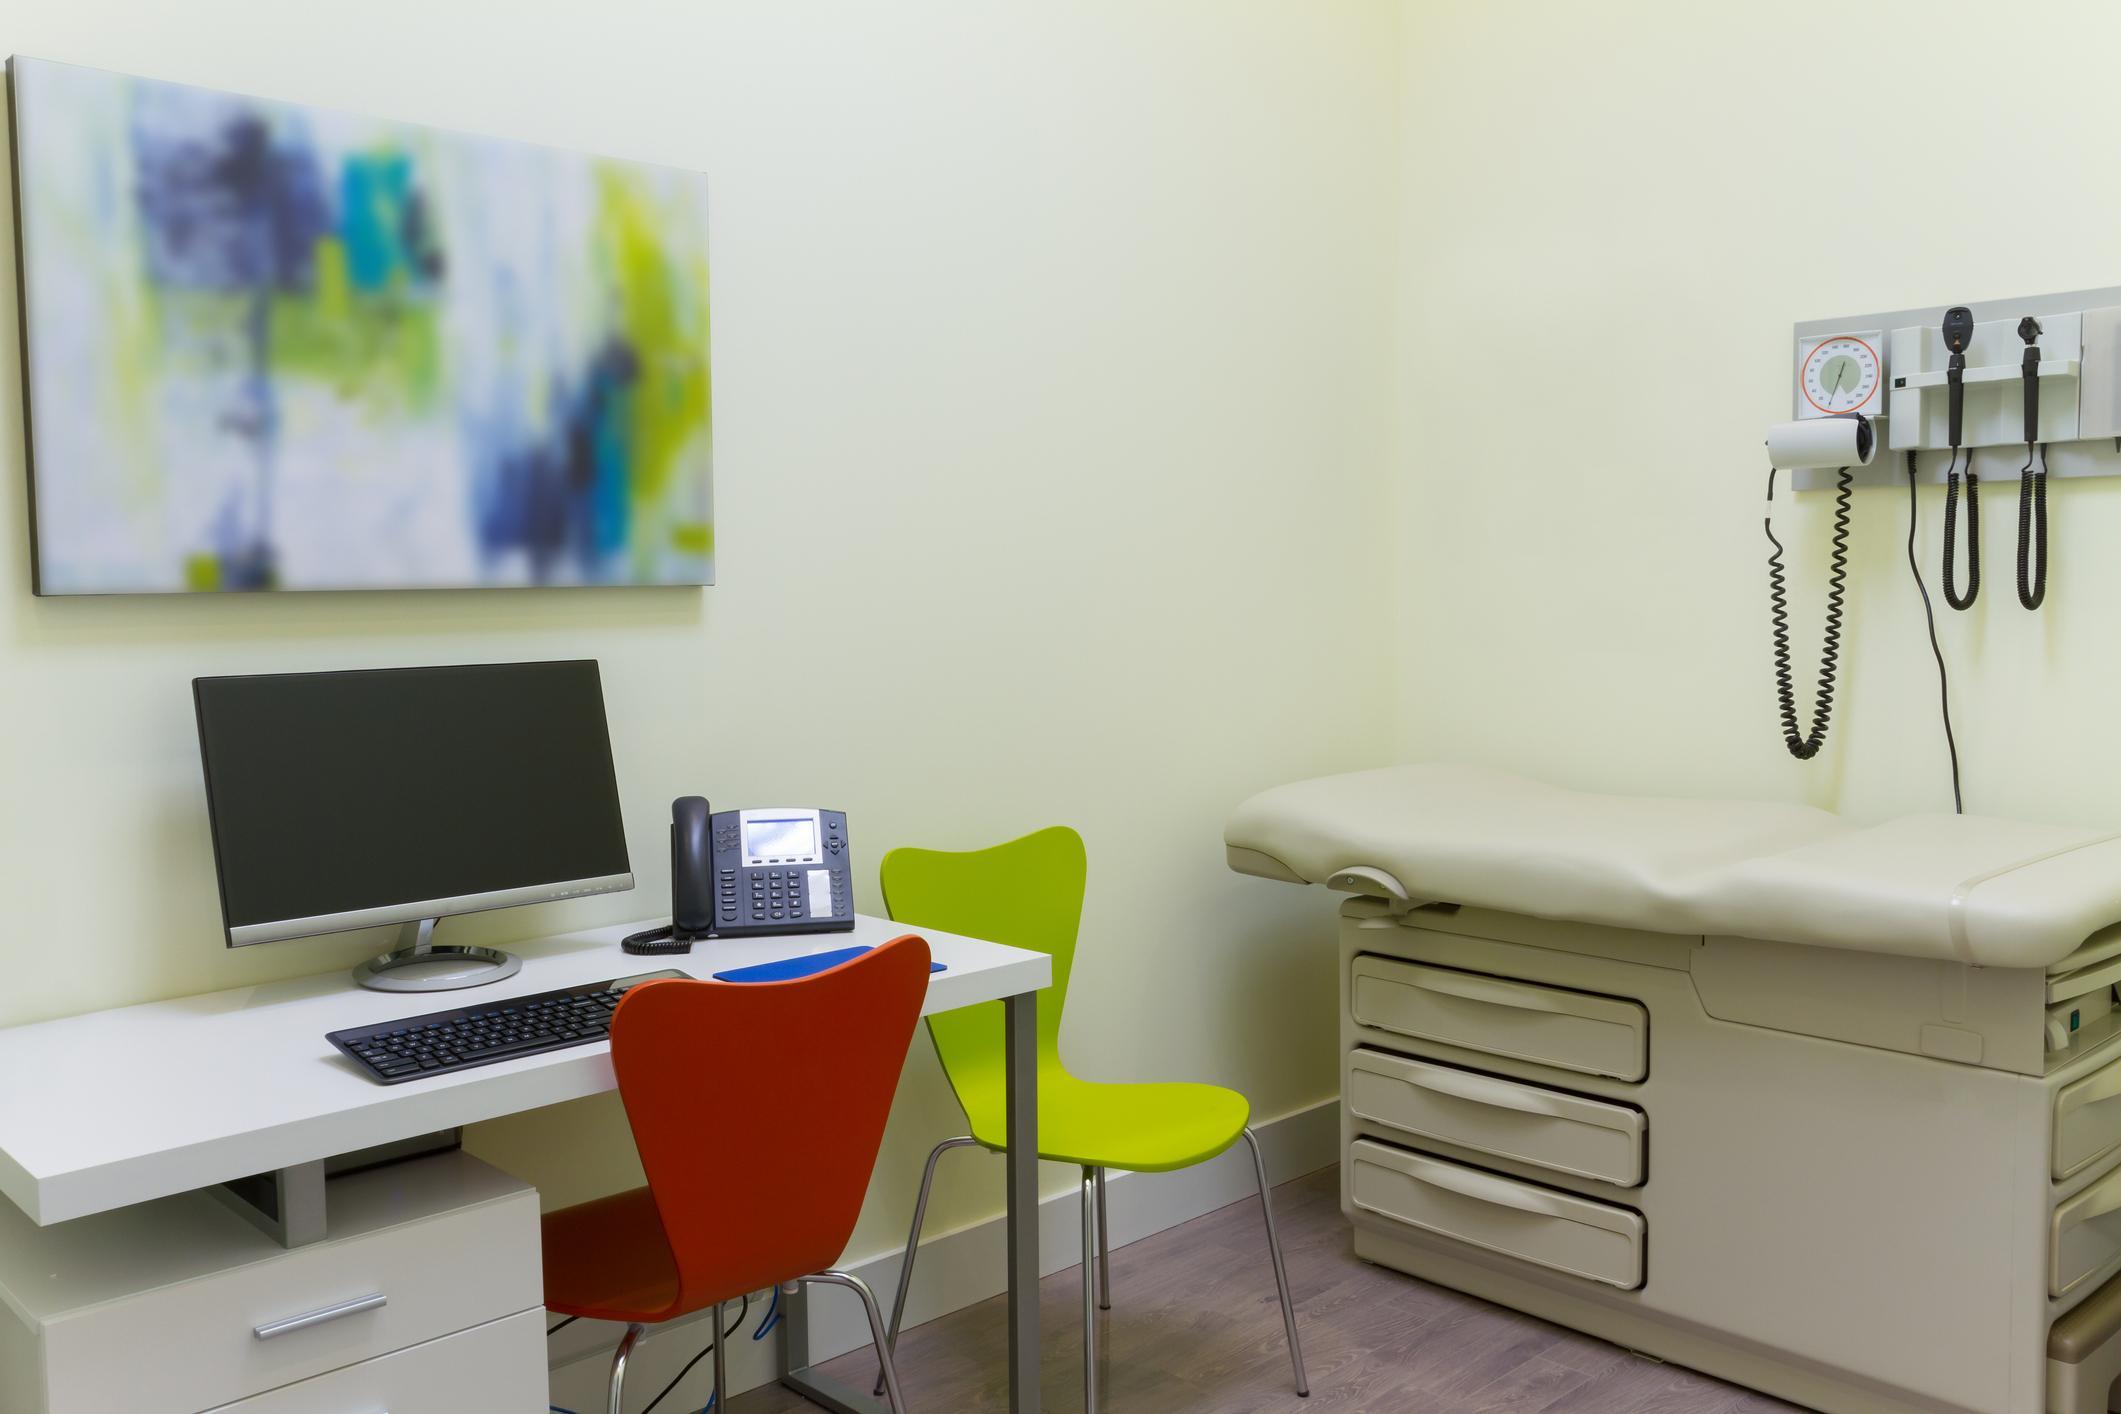 3-doctors-office-1562948596567.jpg